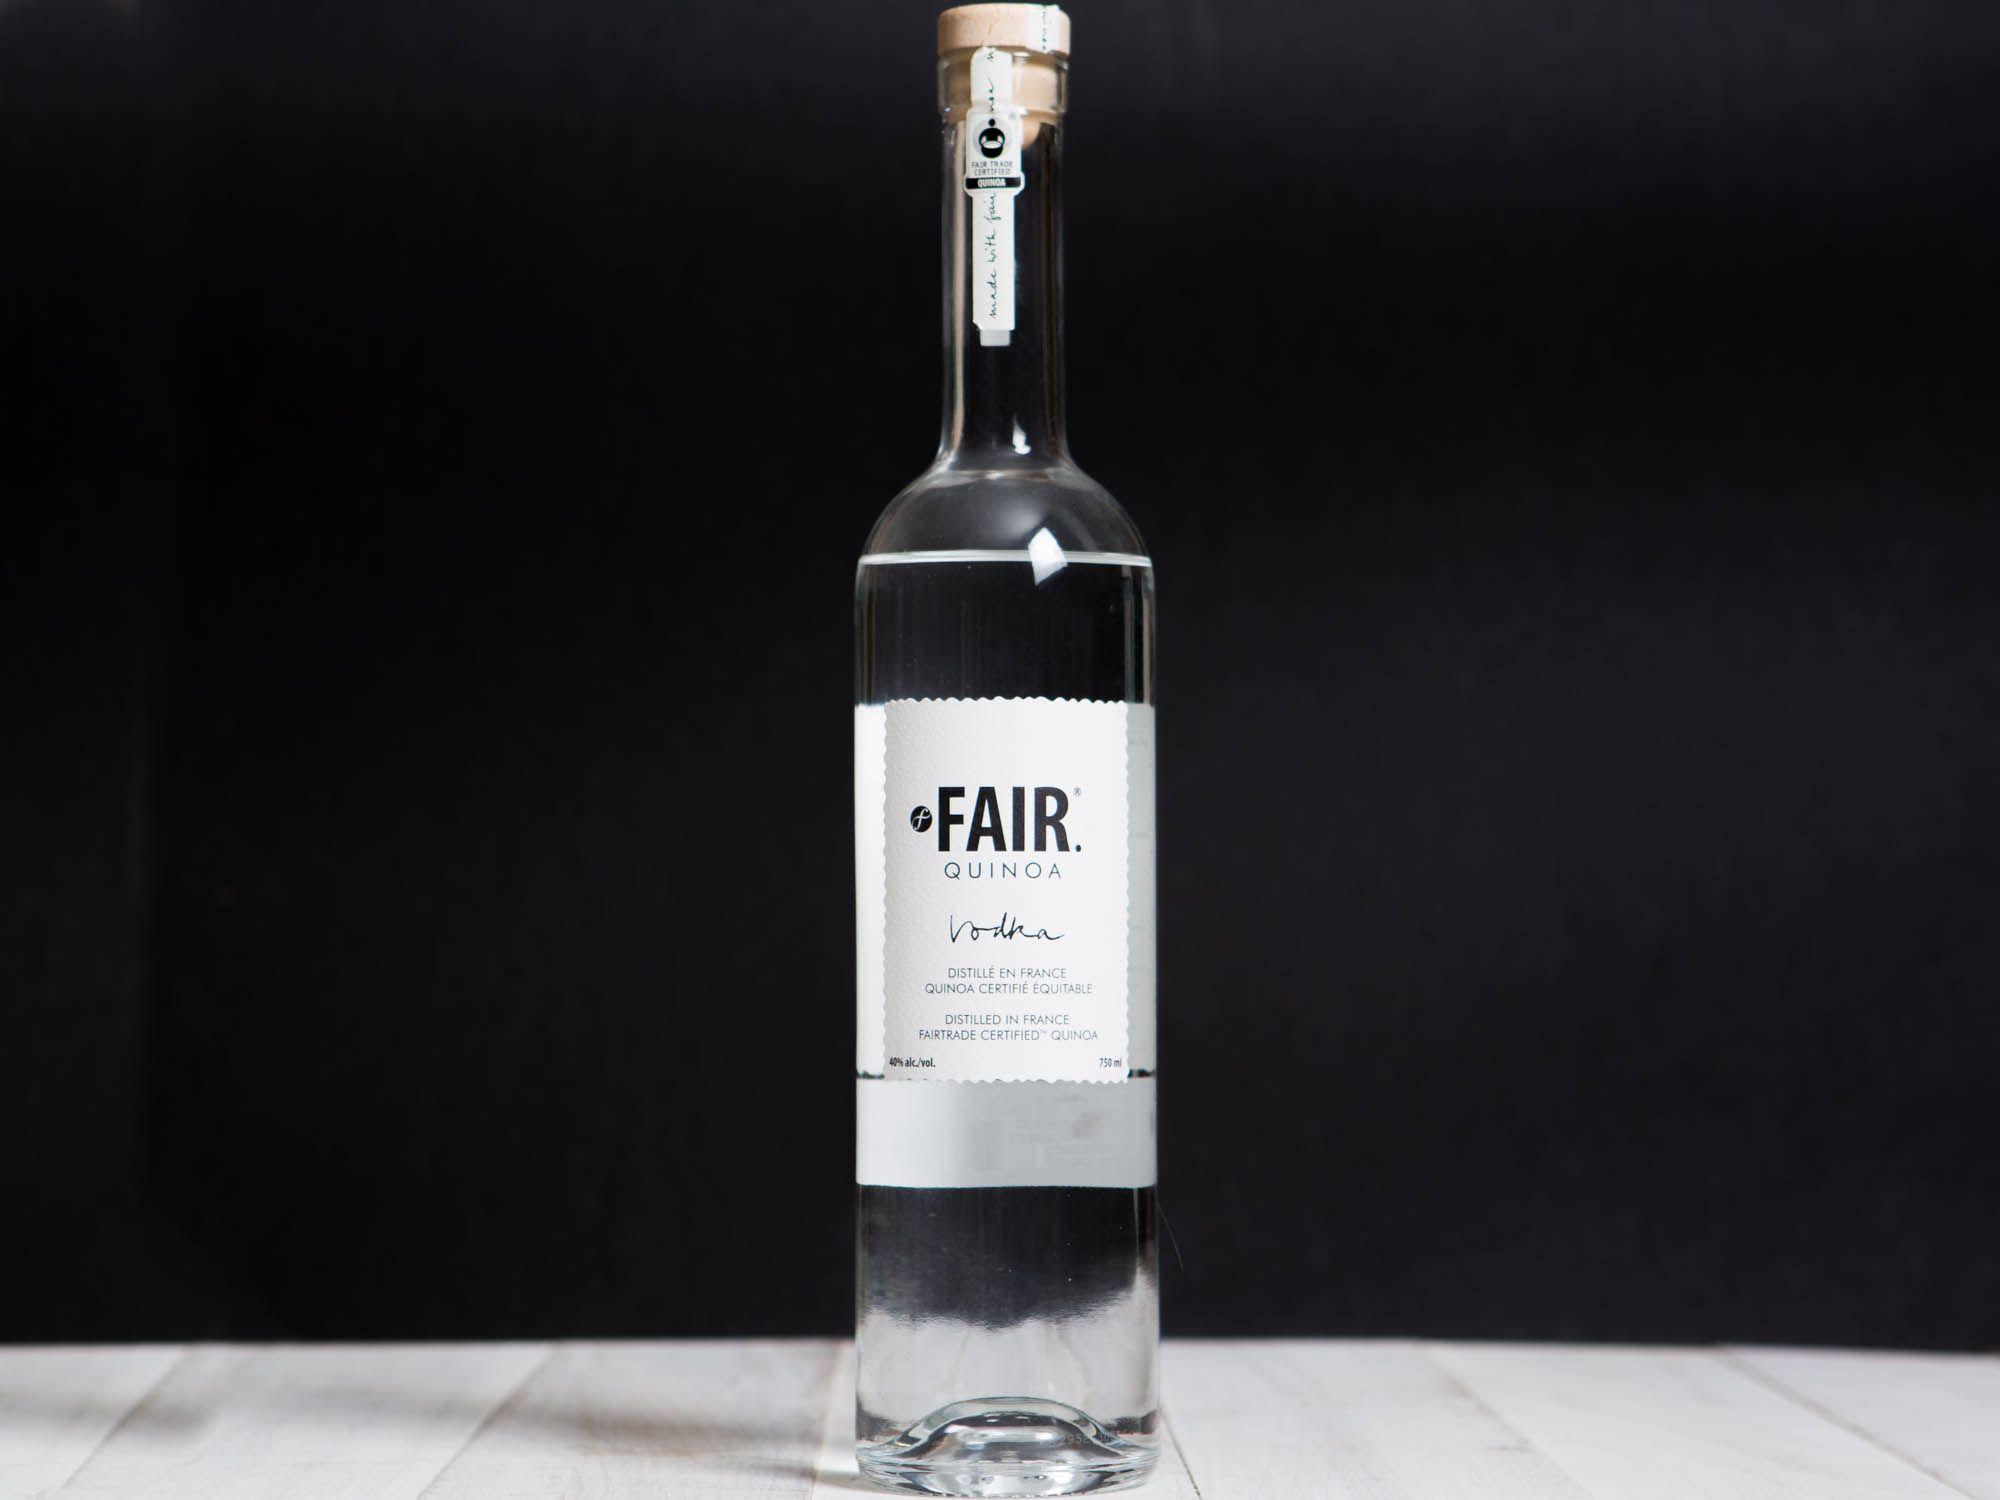 20150714-vodka-fair-quinoa-vicky-wasik-3.jpg